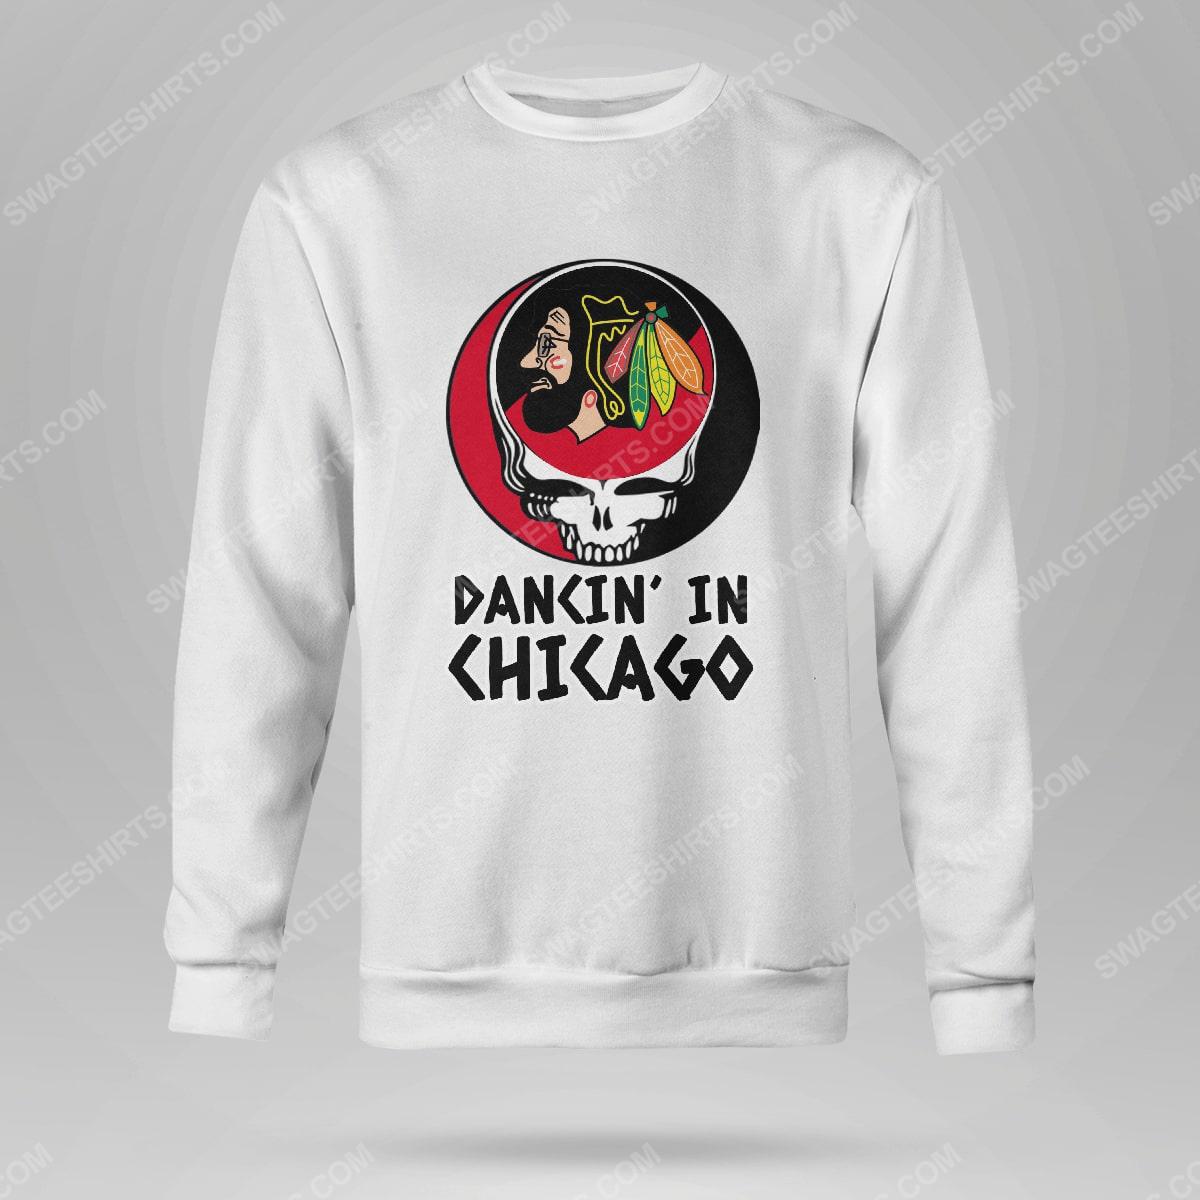 NHL chicago blackhawks and grateful dead dancin in chicago sweatshirt(1)